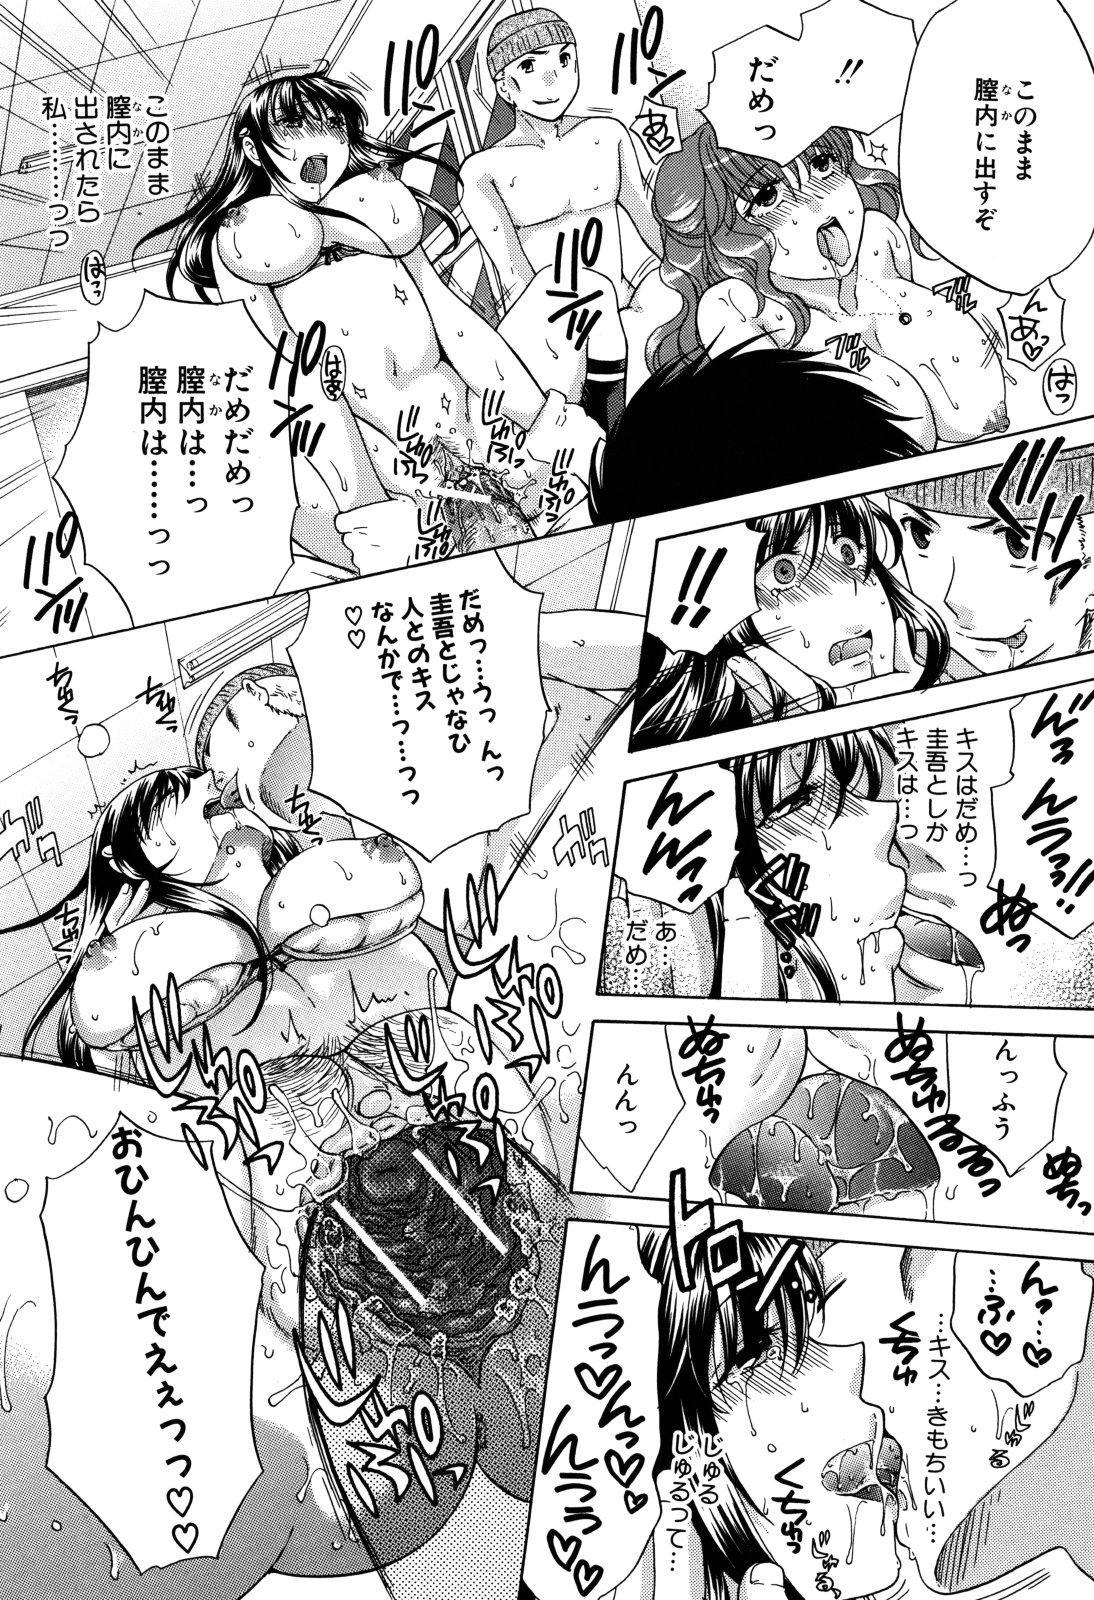 Kanojo ga Ochiru made - She in the depth 199